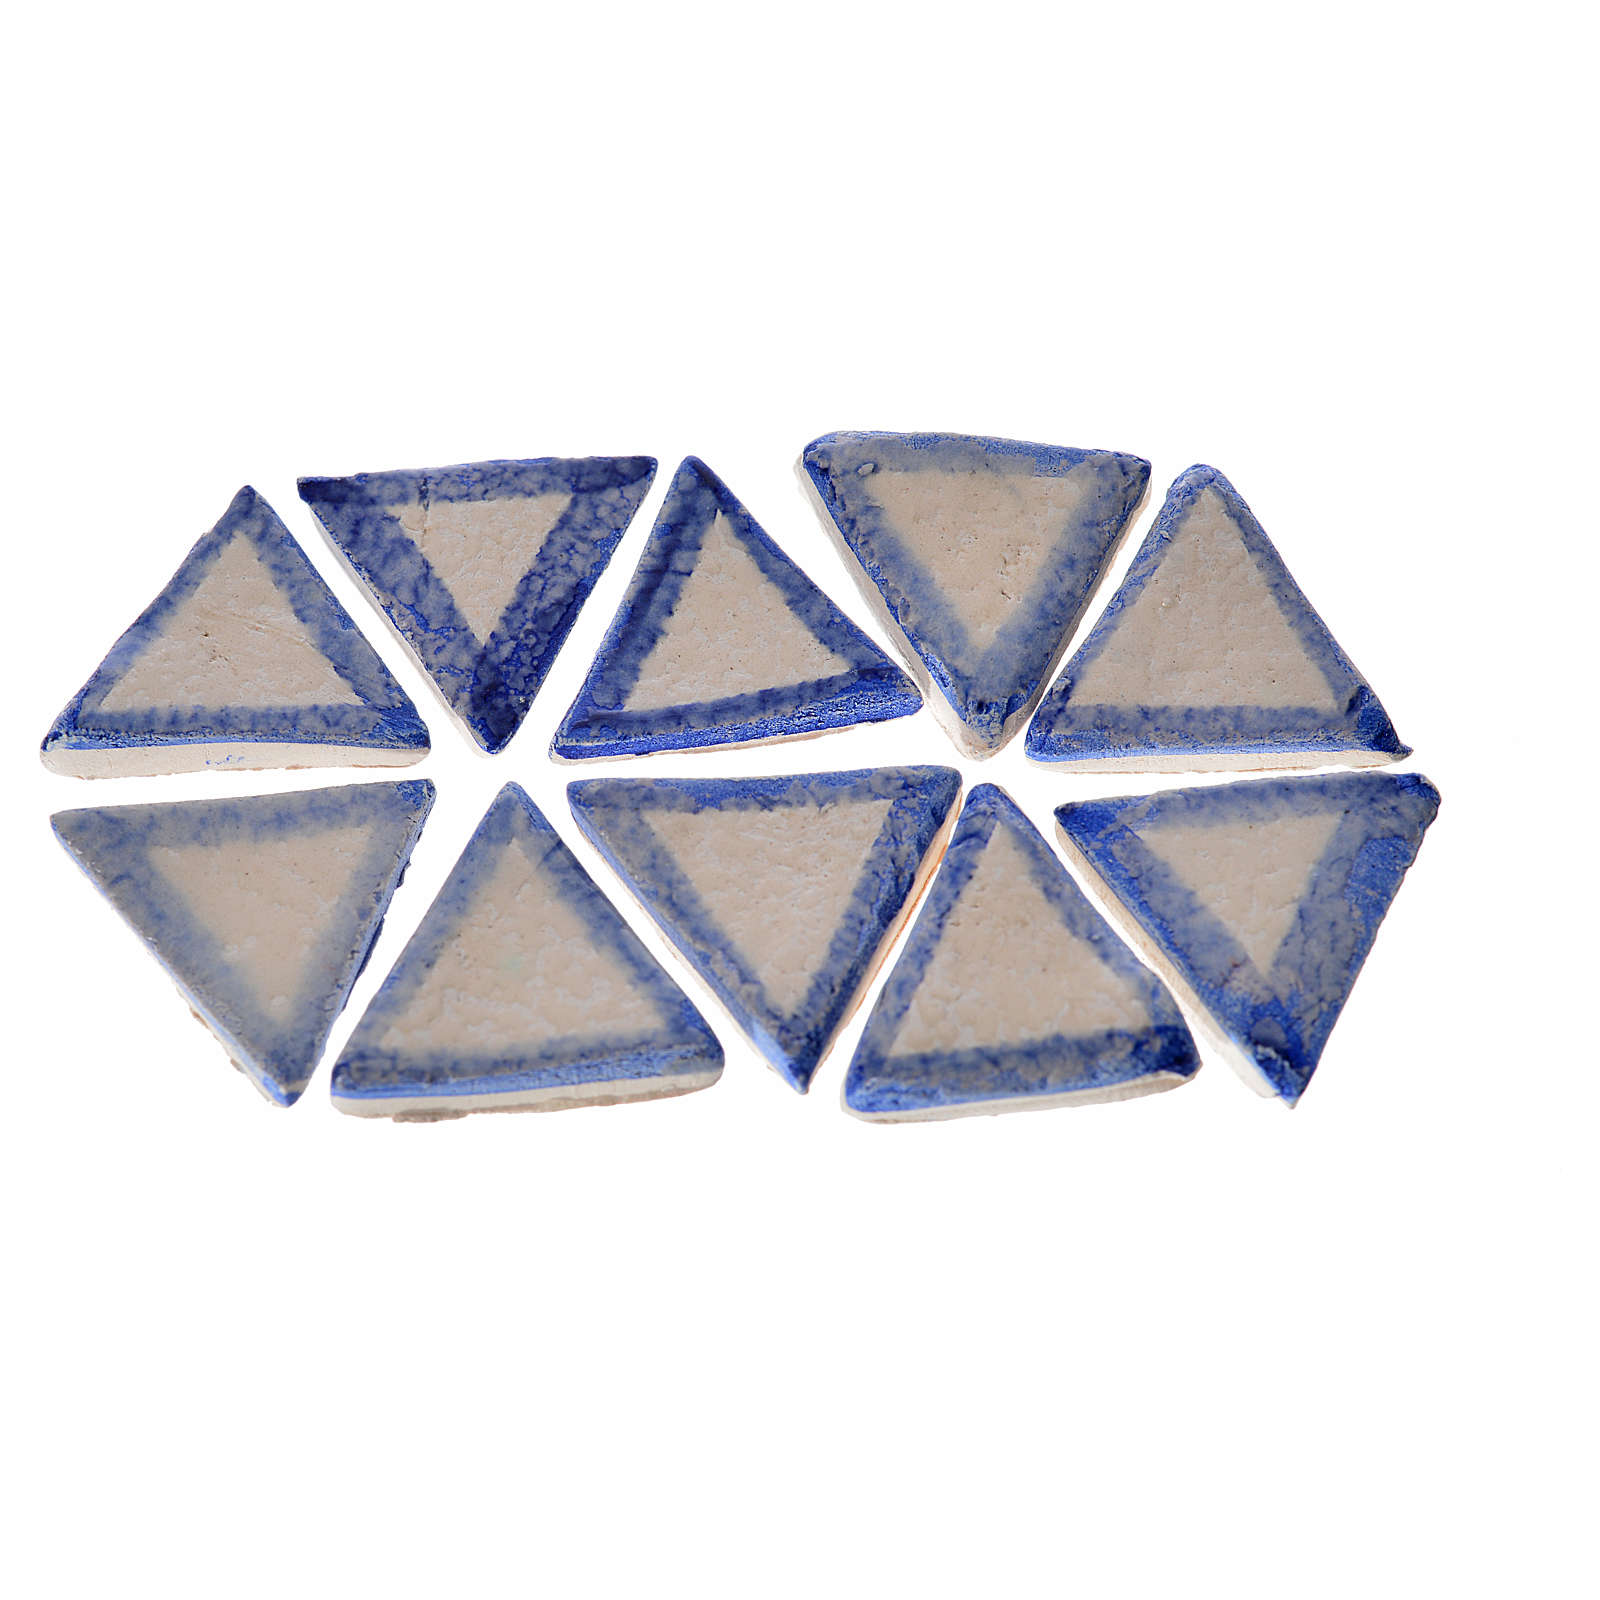 Nativity accessory, terracotta tiles with enamel, triangular, 60 4